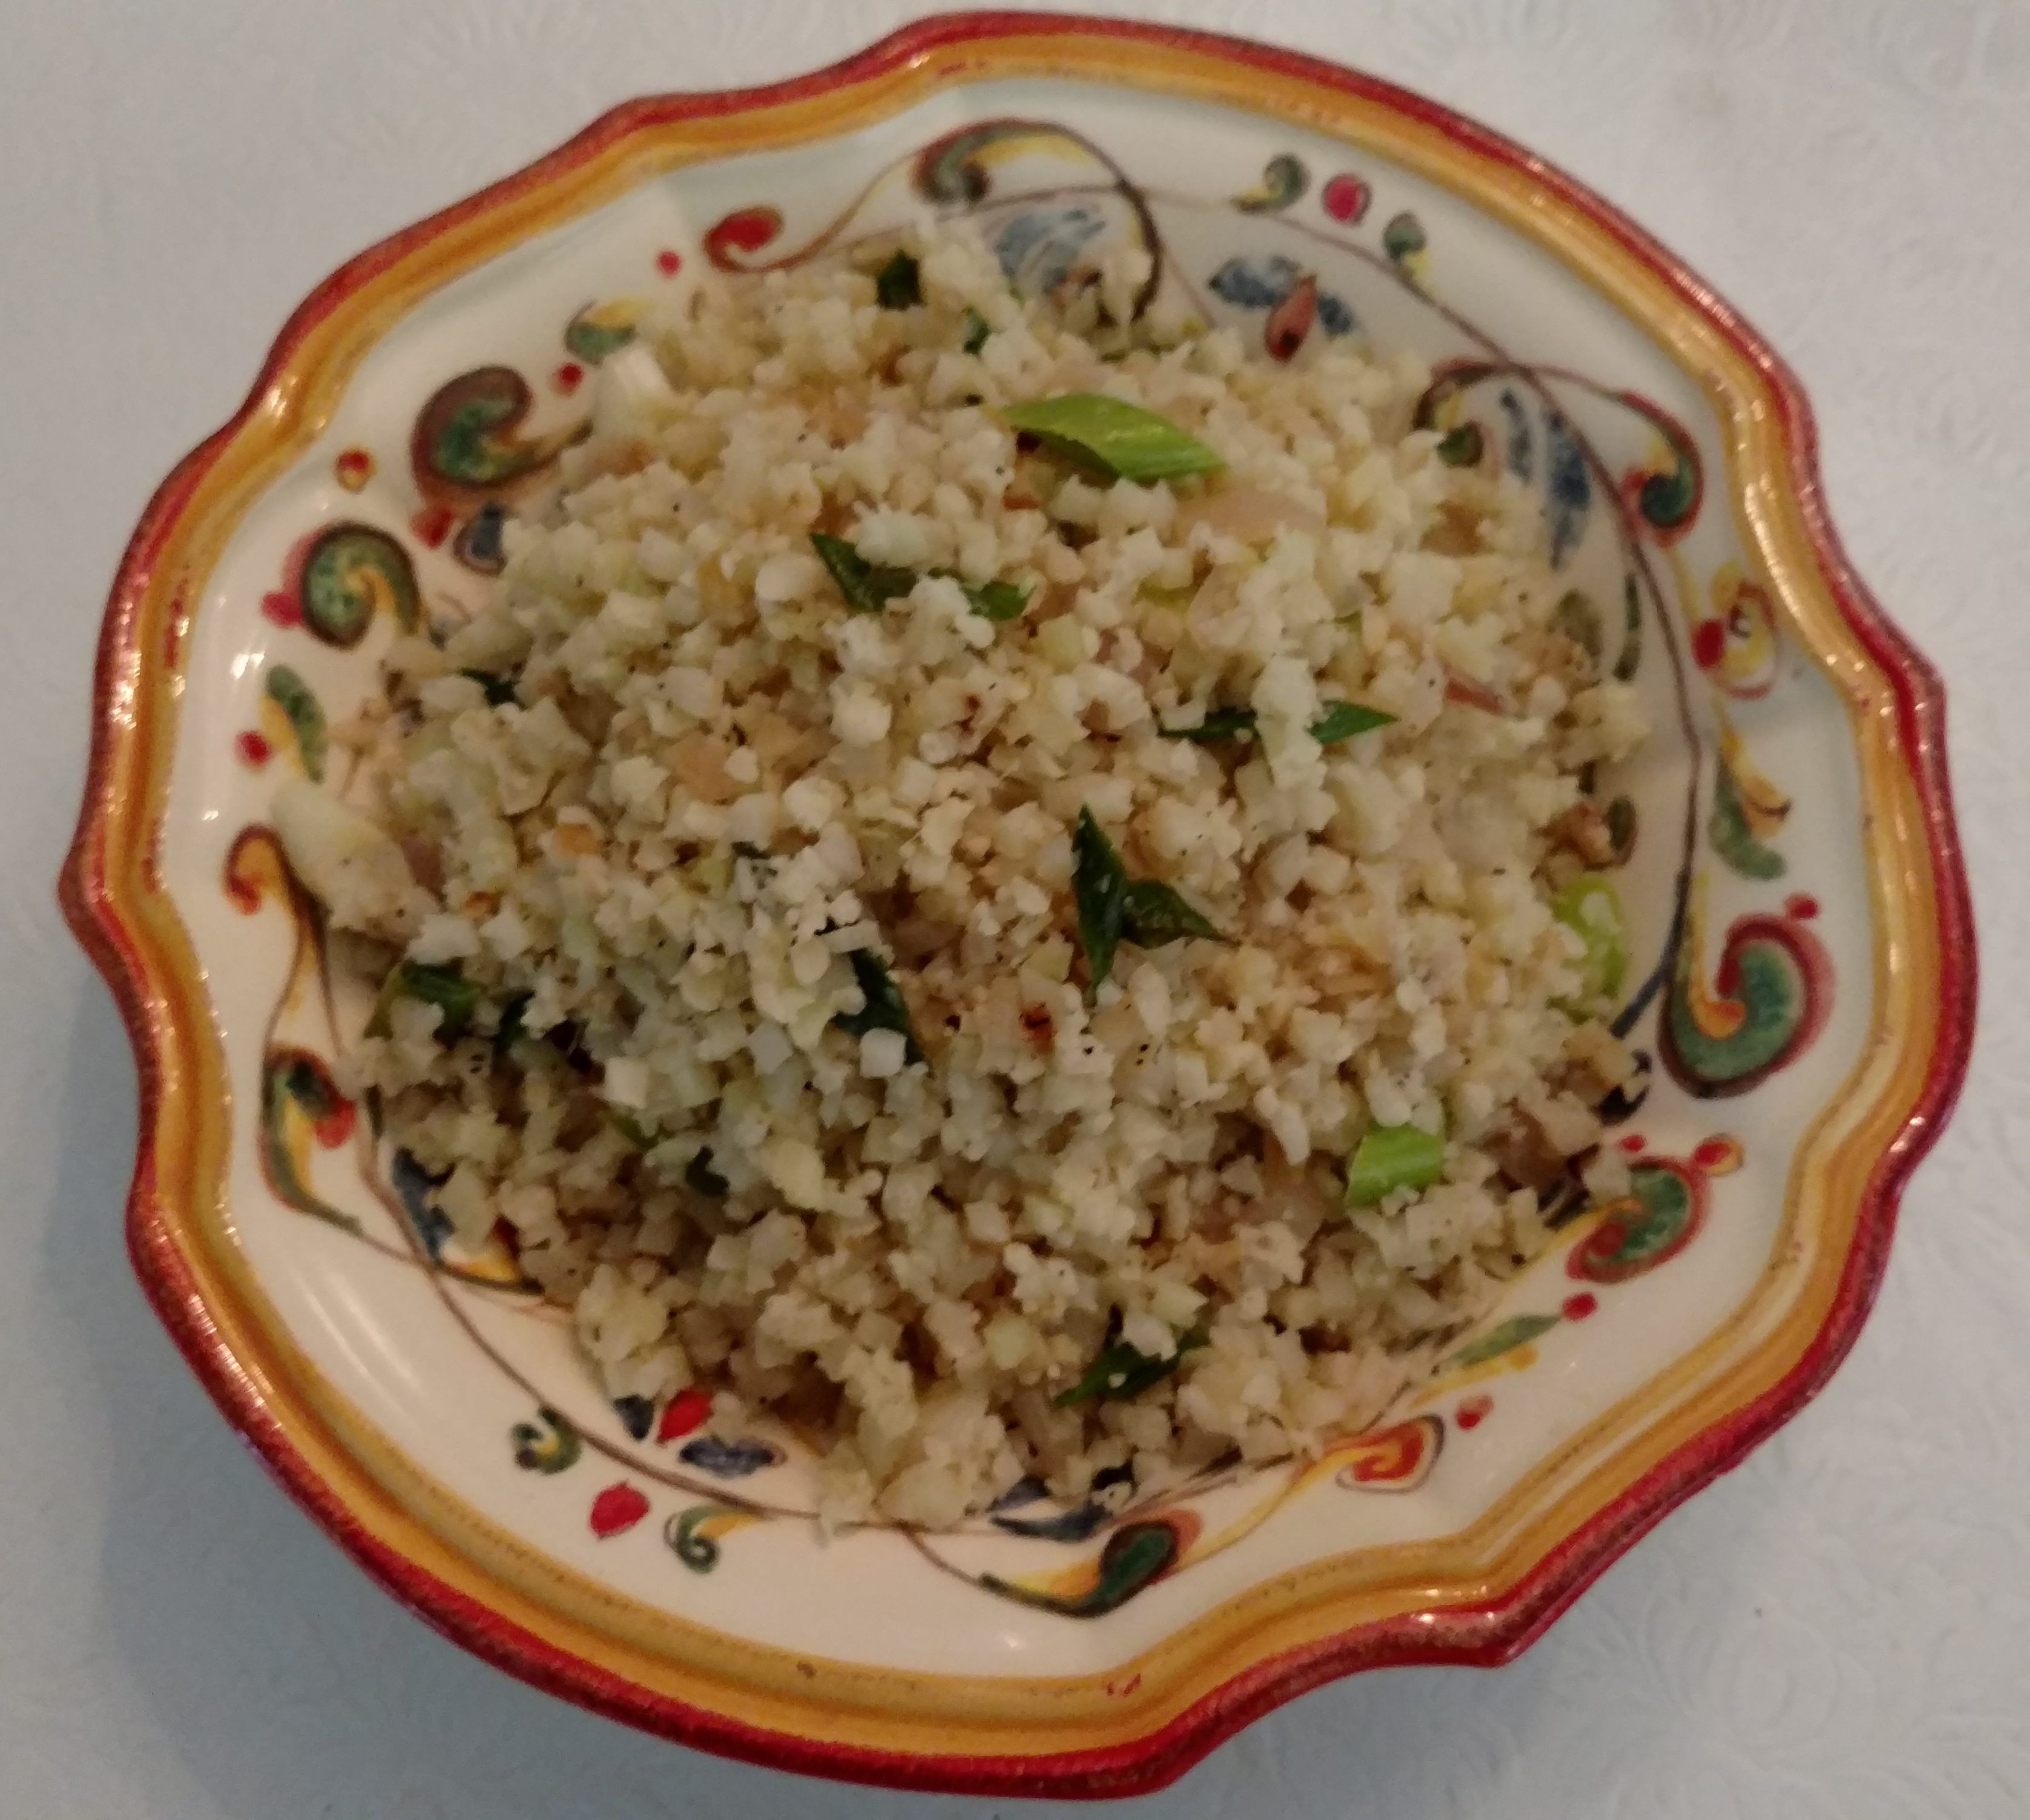 Cauliflower Rice with Green Garlic